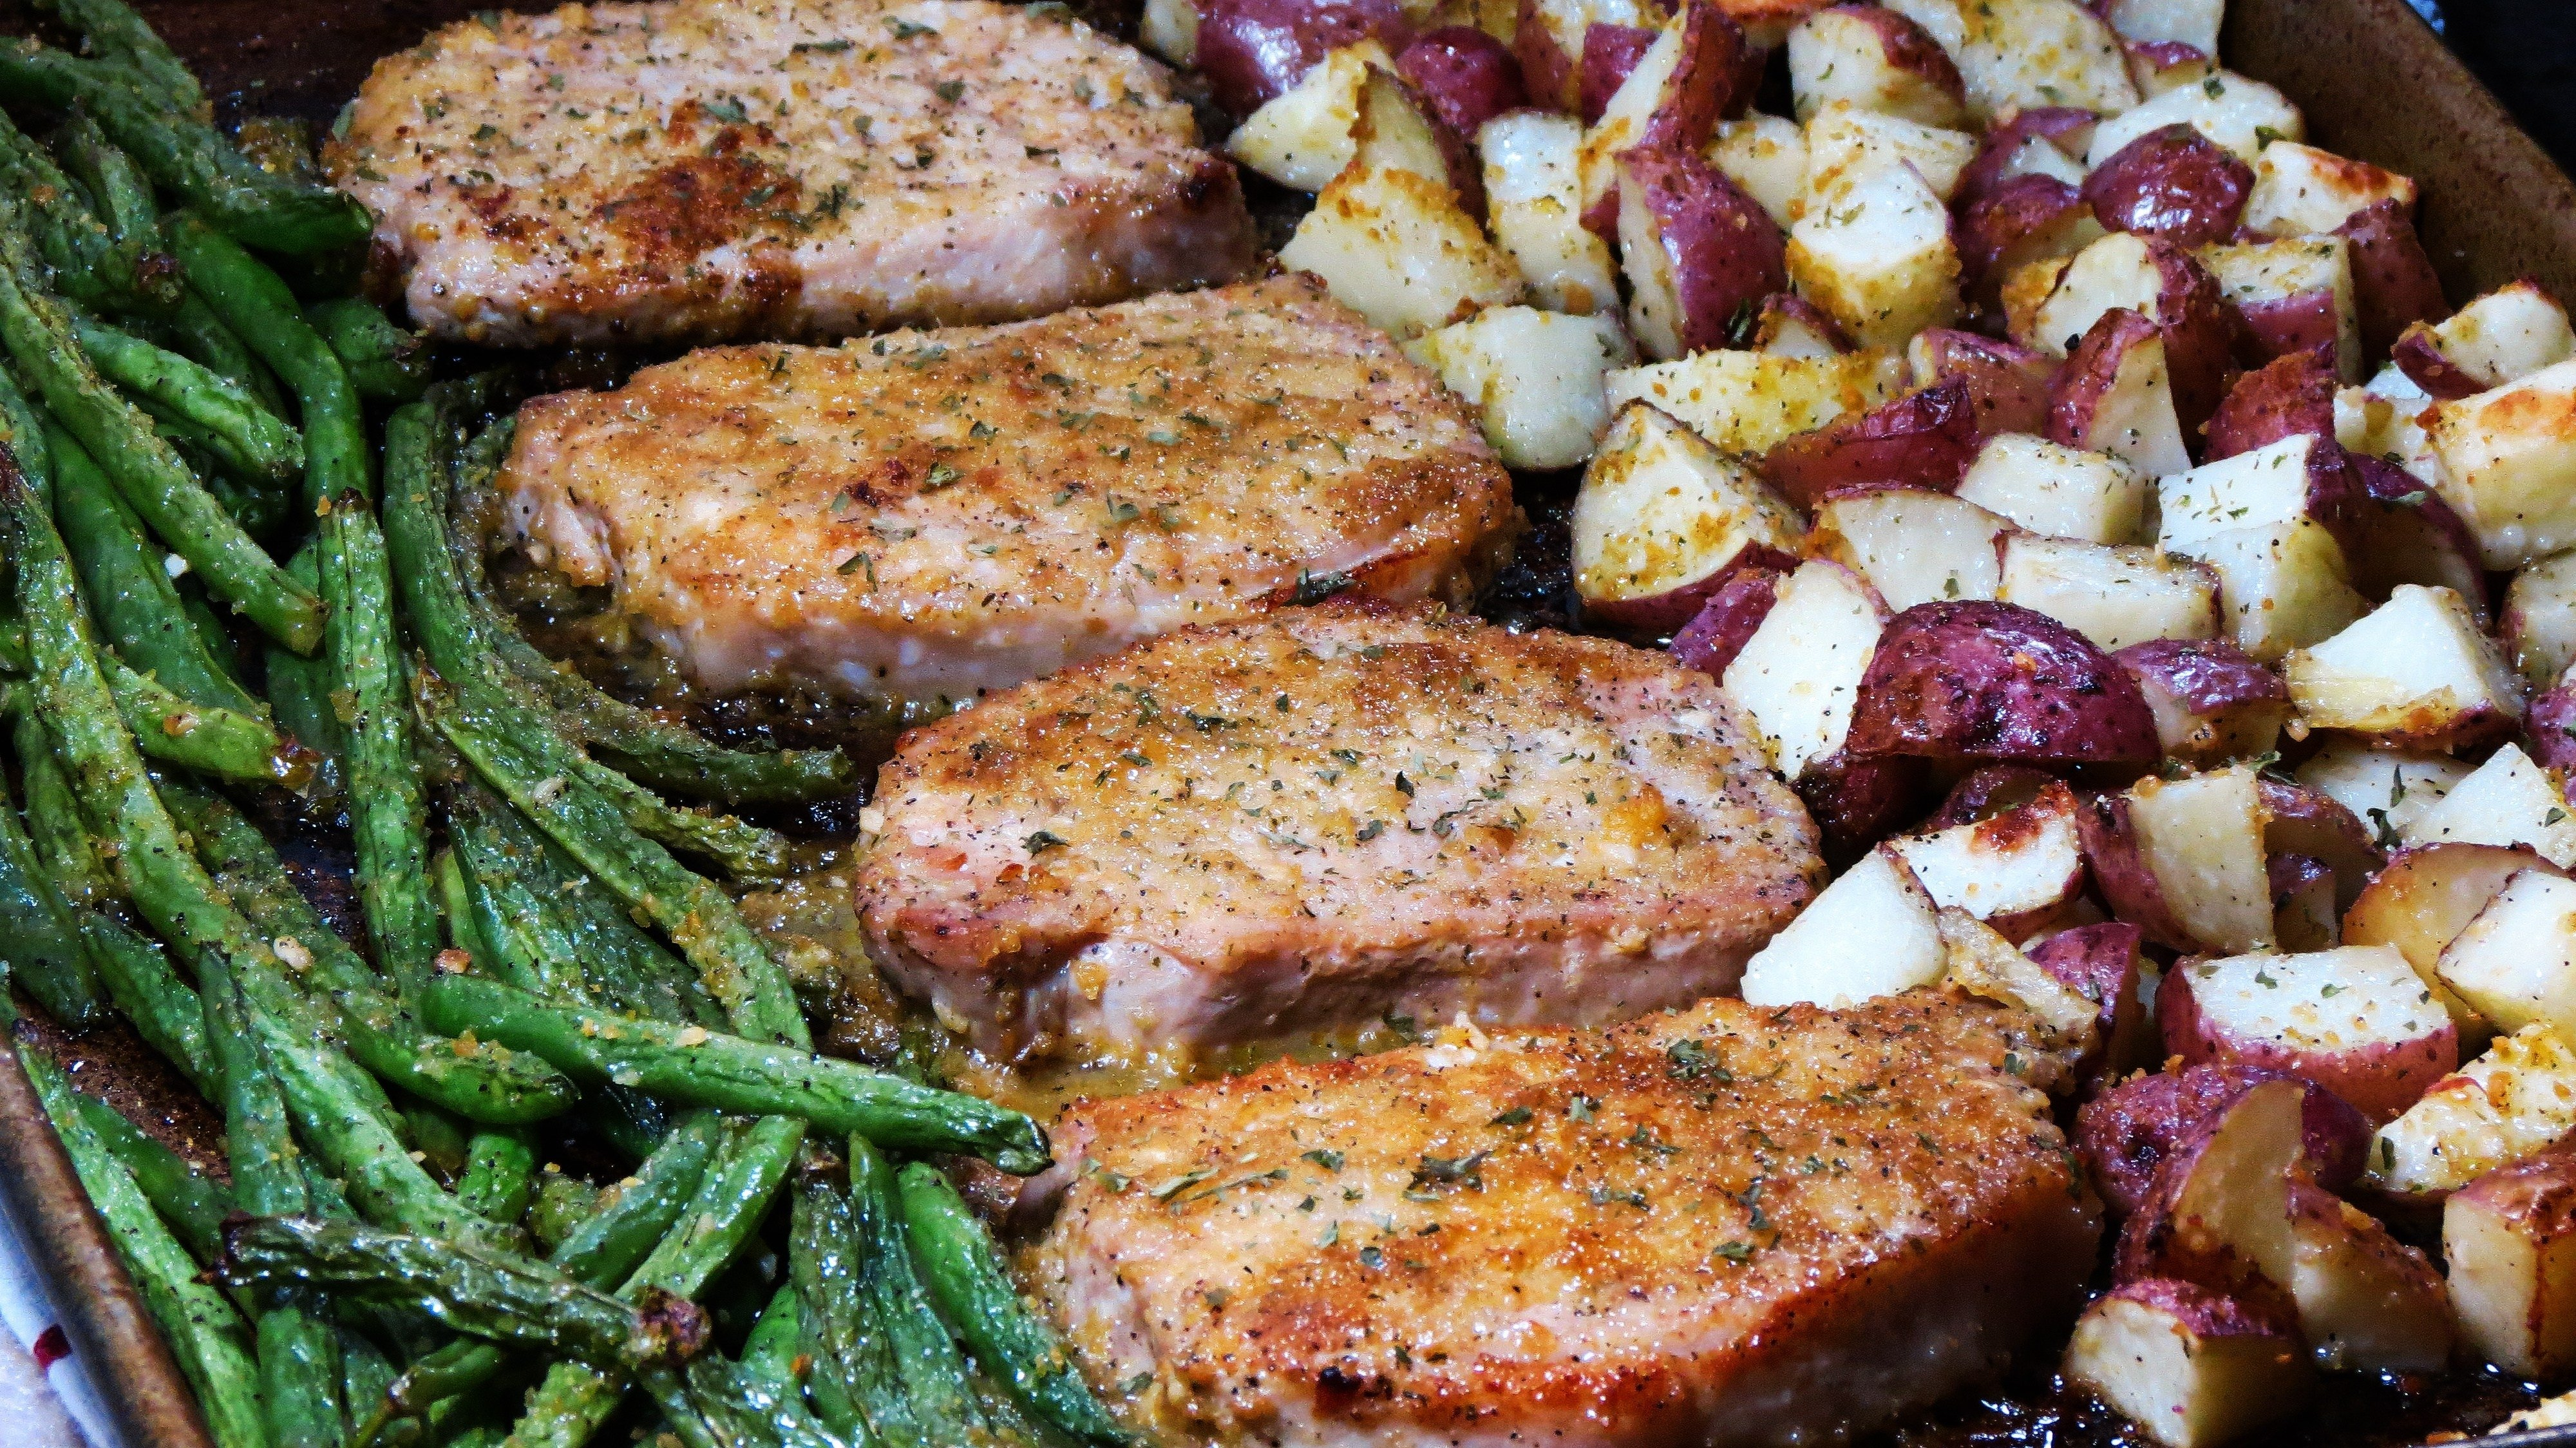 10 Stylish Dinner Ideas With Pork Chops sheet pan pork chops dinner recipe im luving this life 2021